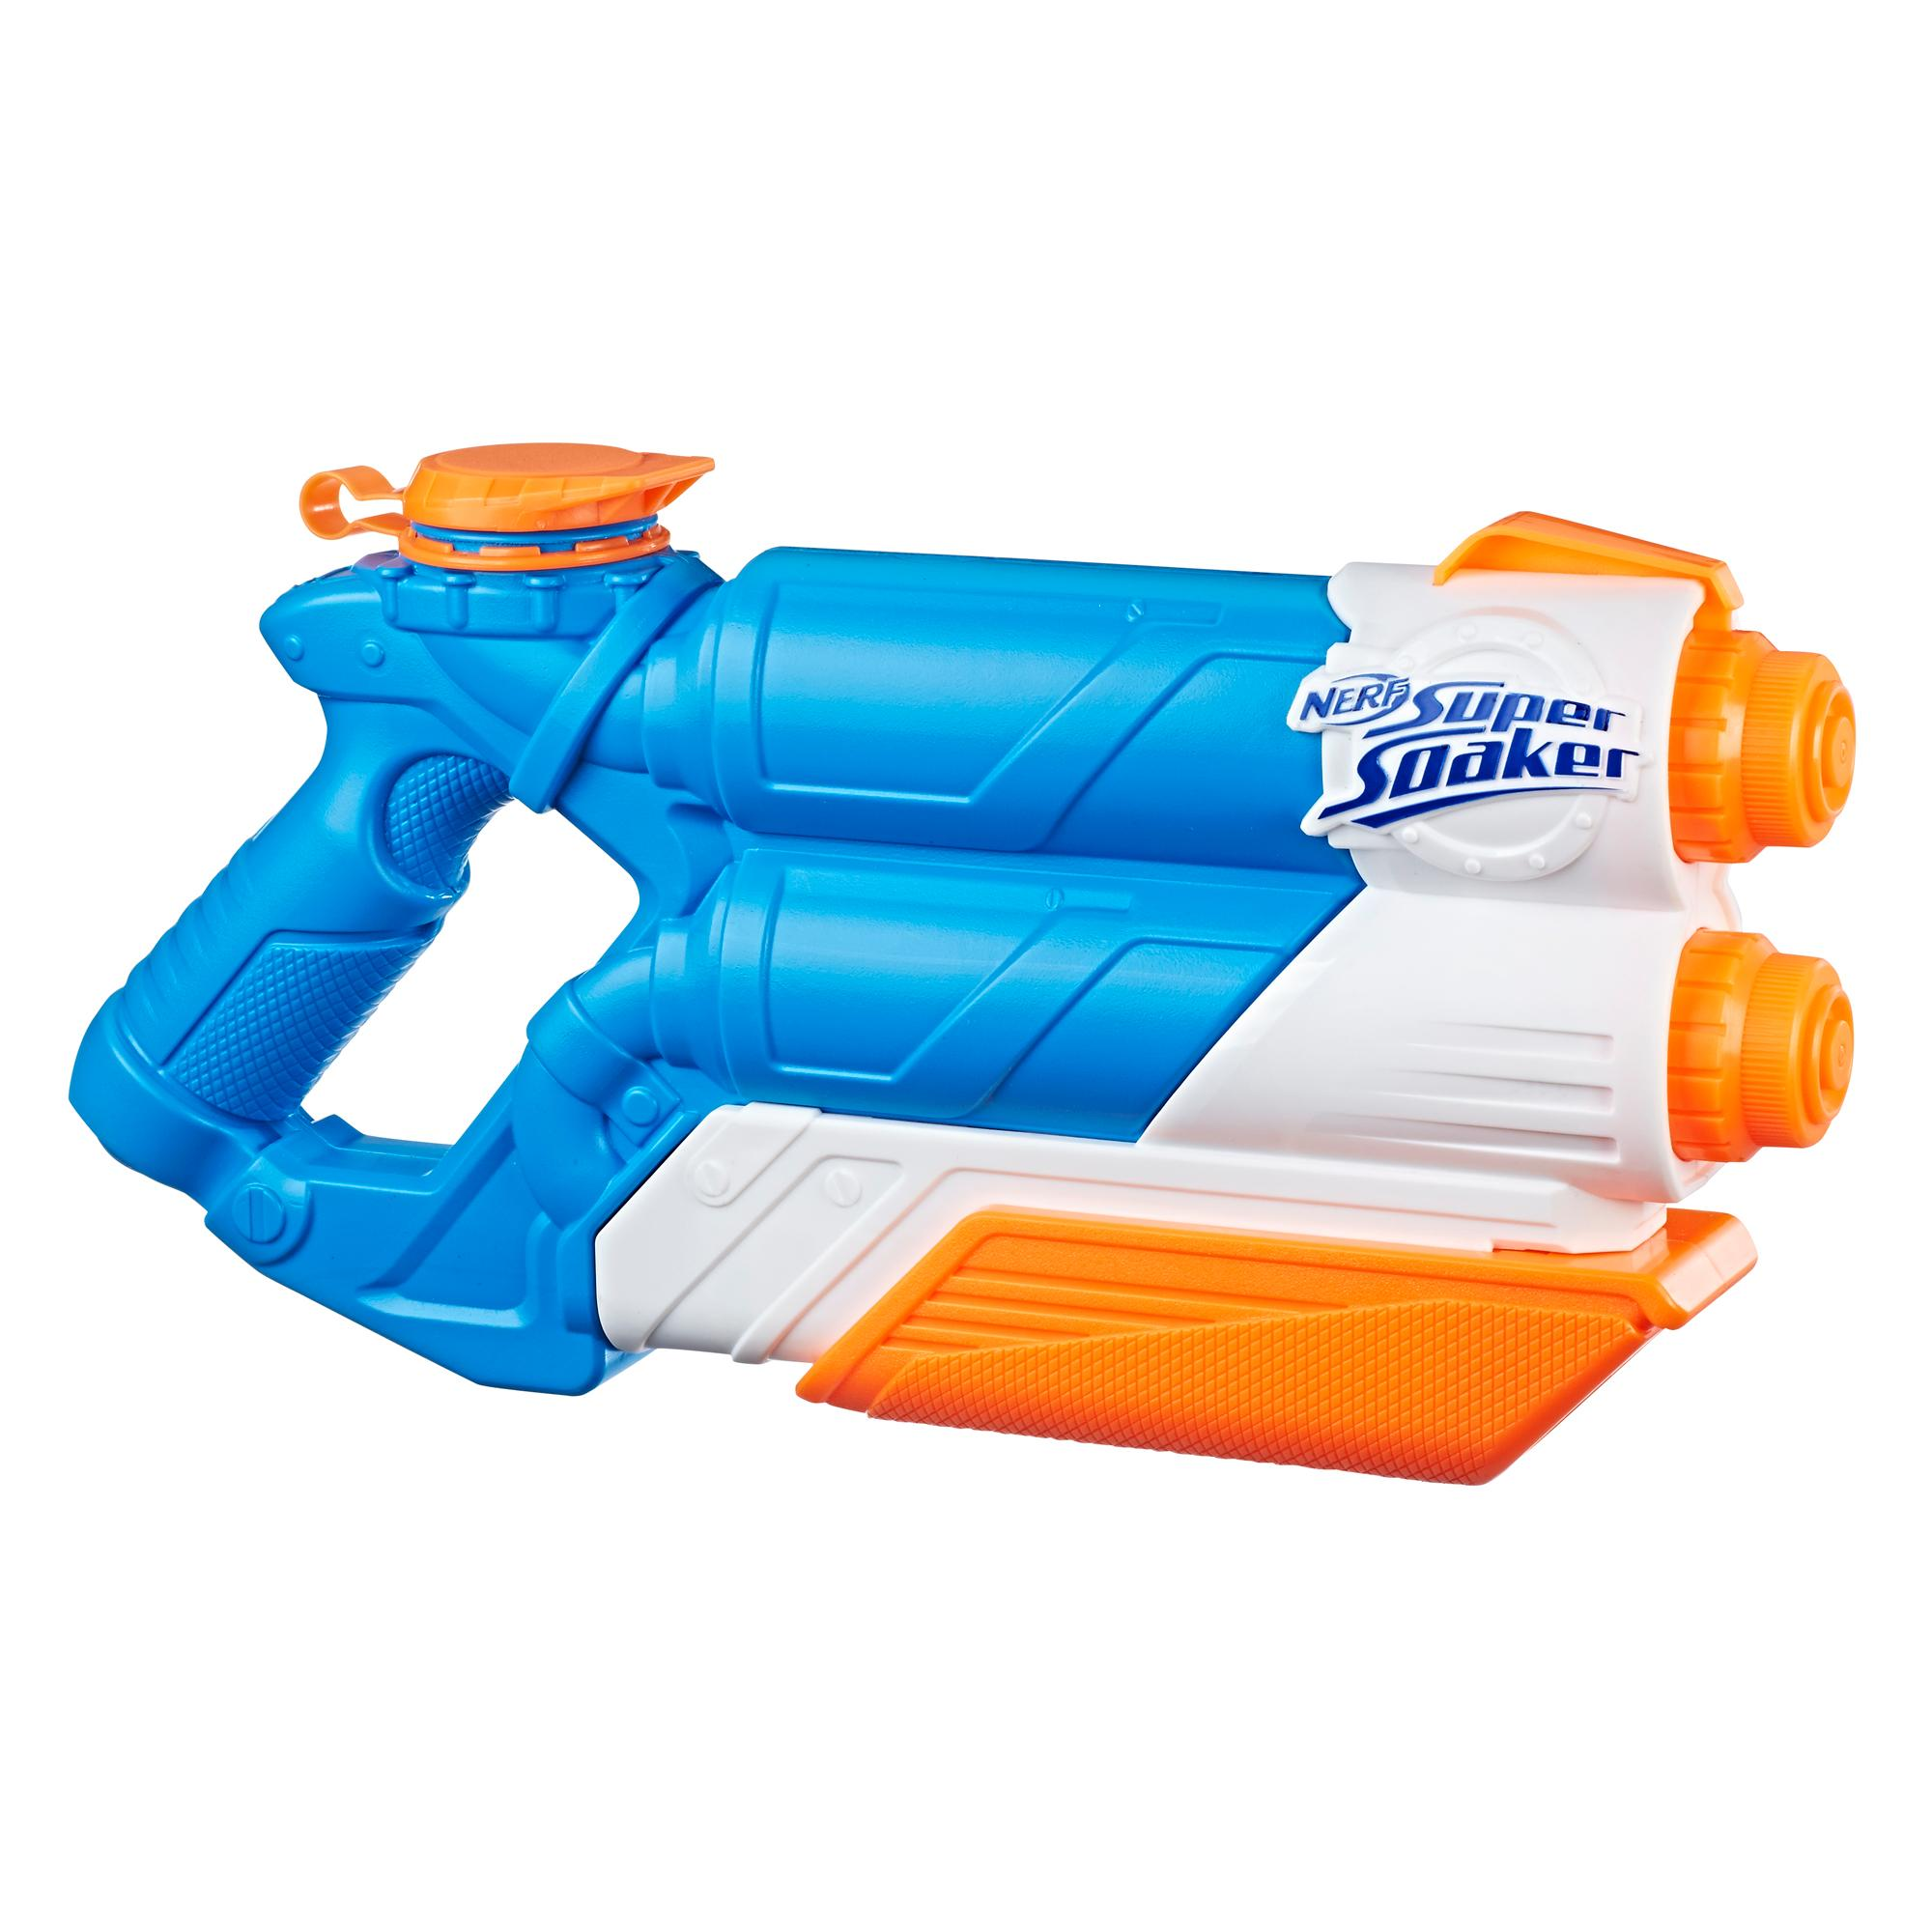 Nerf 威水槍 雙子槍